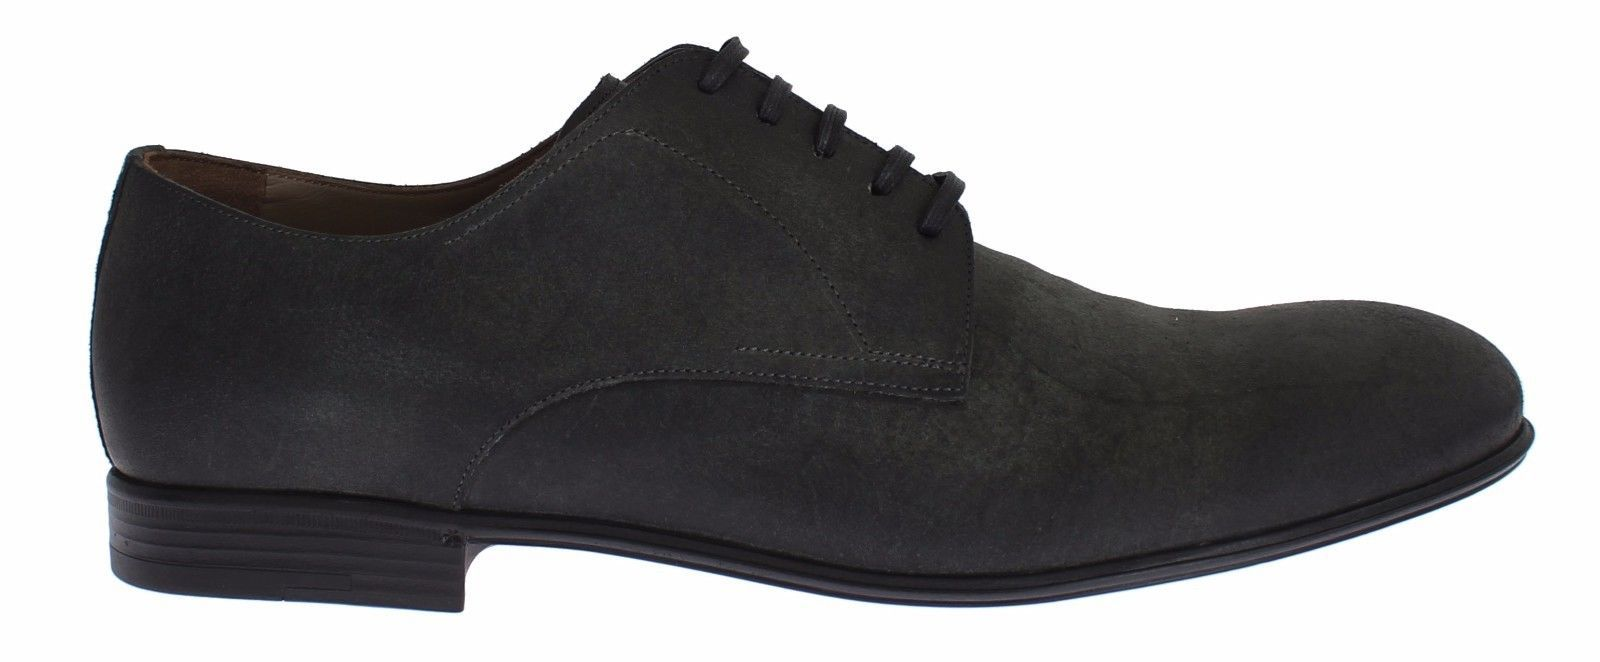 Dolce & Gabbana Men's Leather Formal Derby Shoes Green SIG17141 - EU39/US6